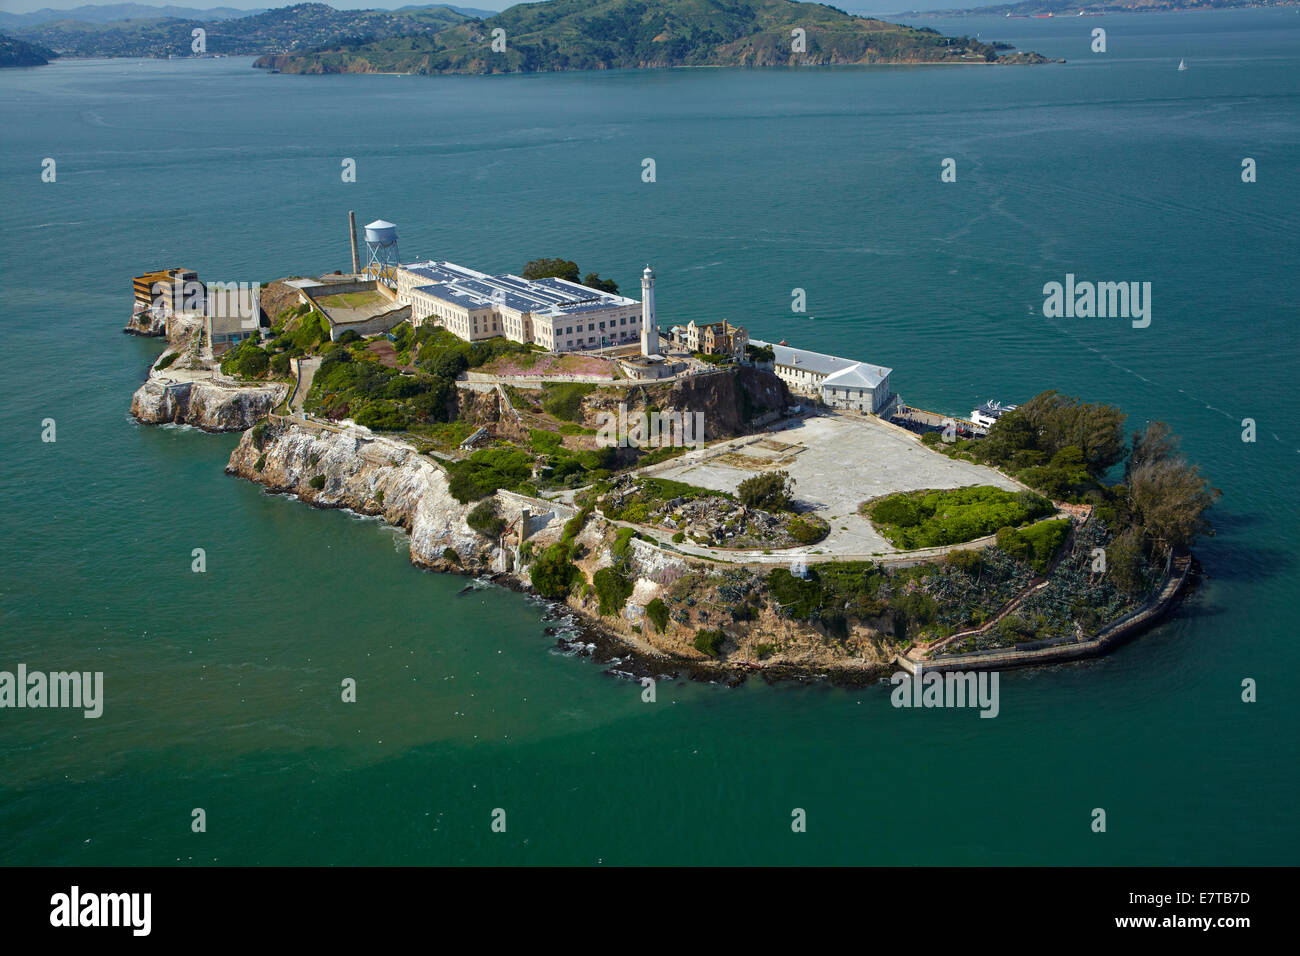 San Francisco Bay Water Tours